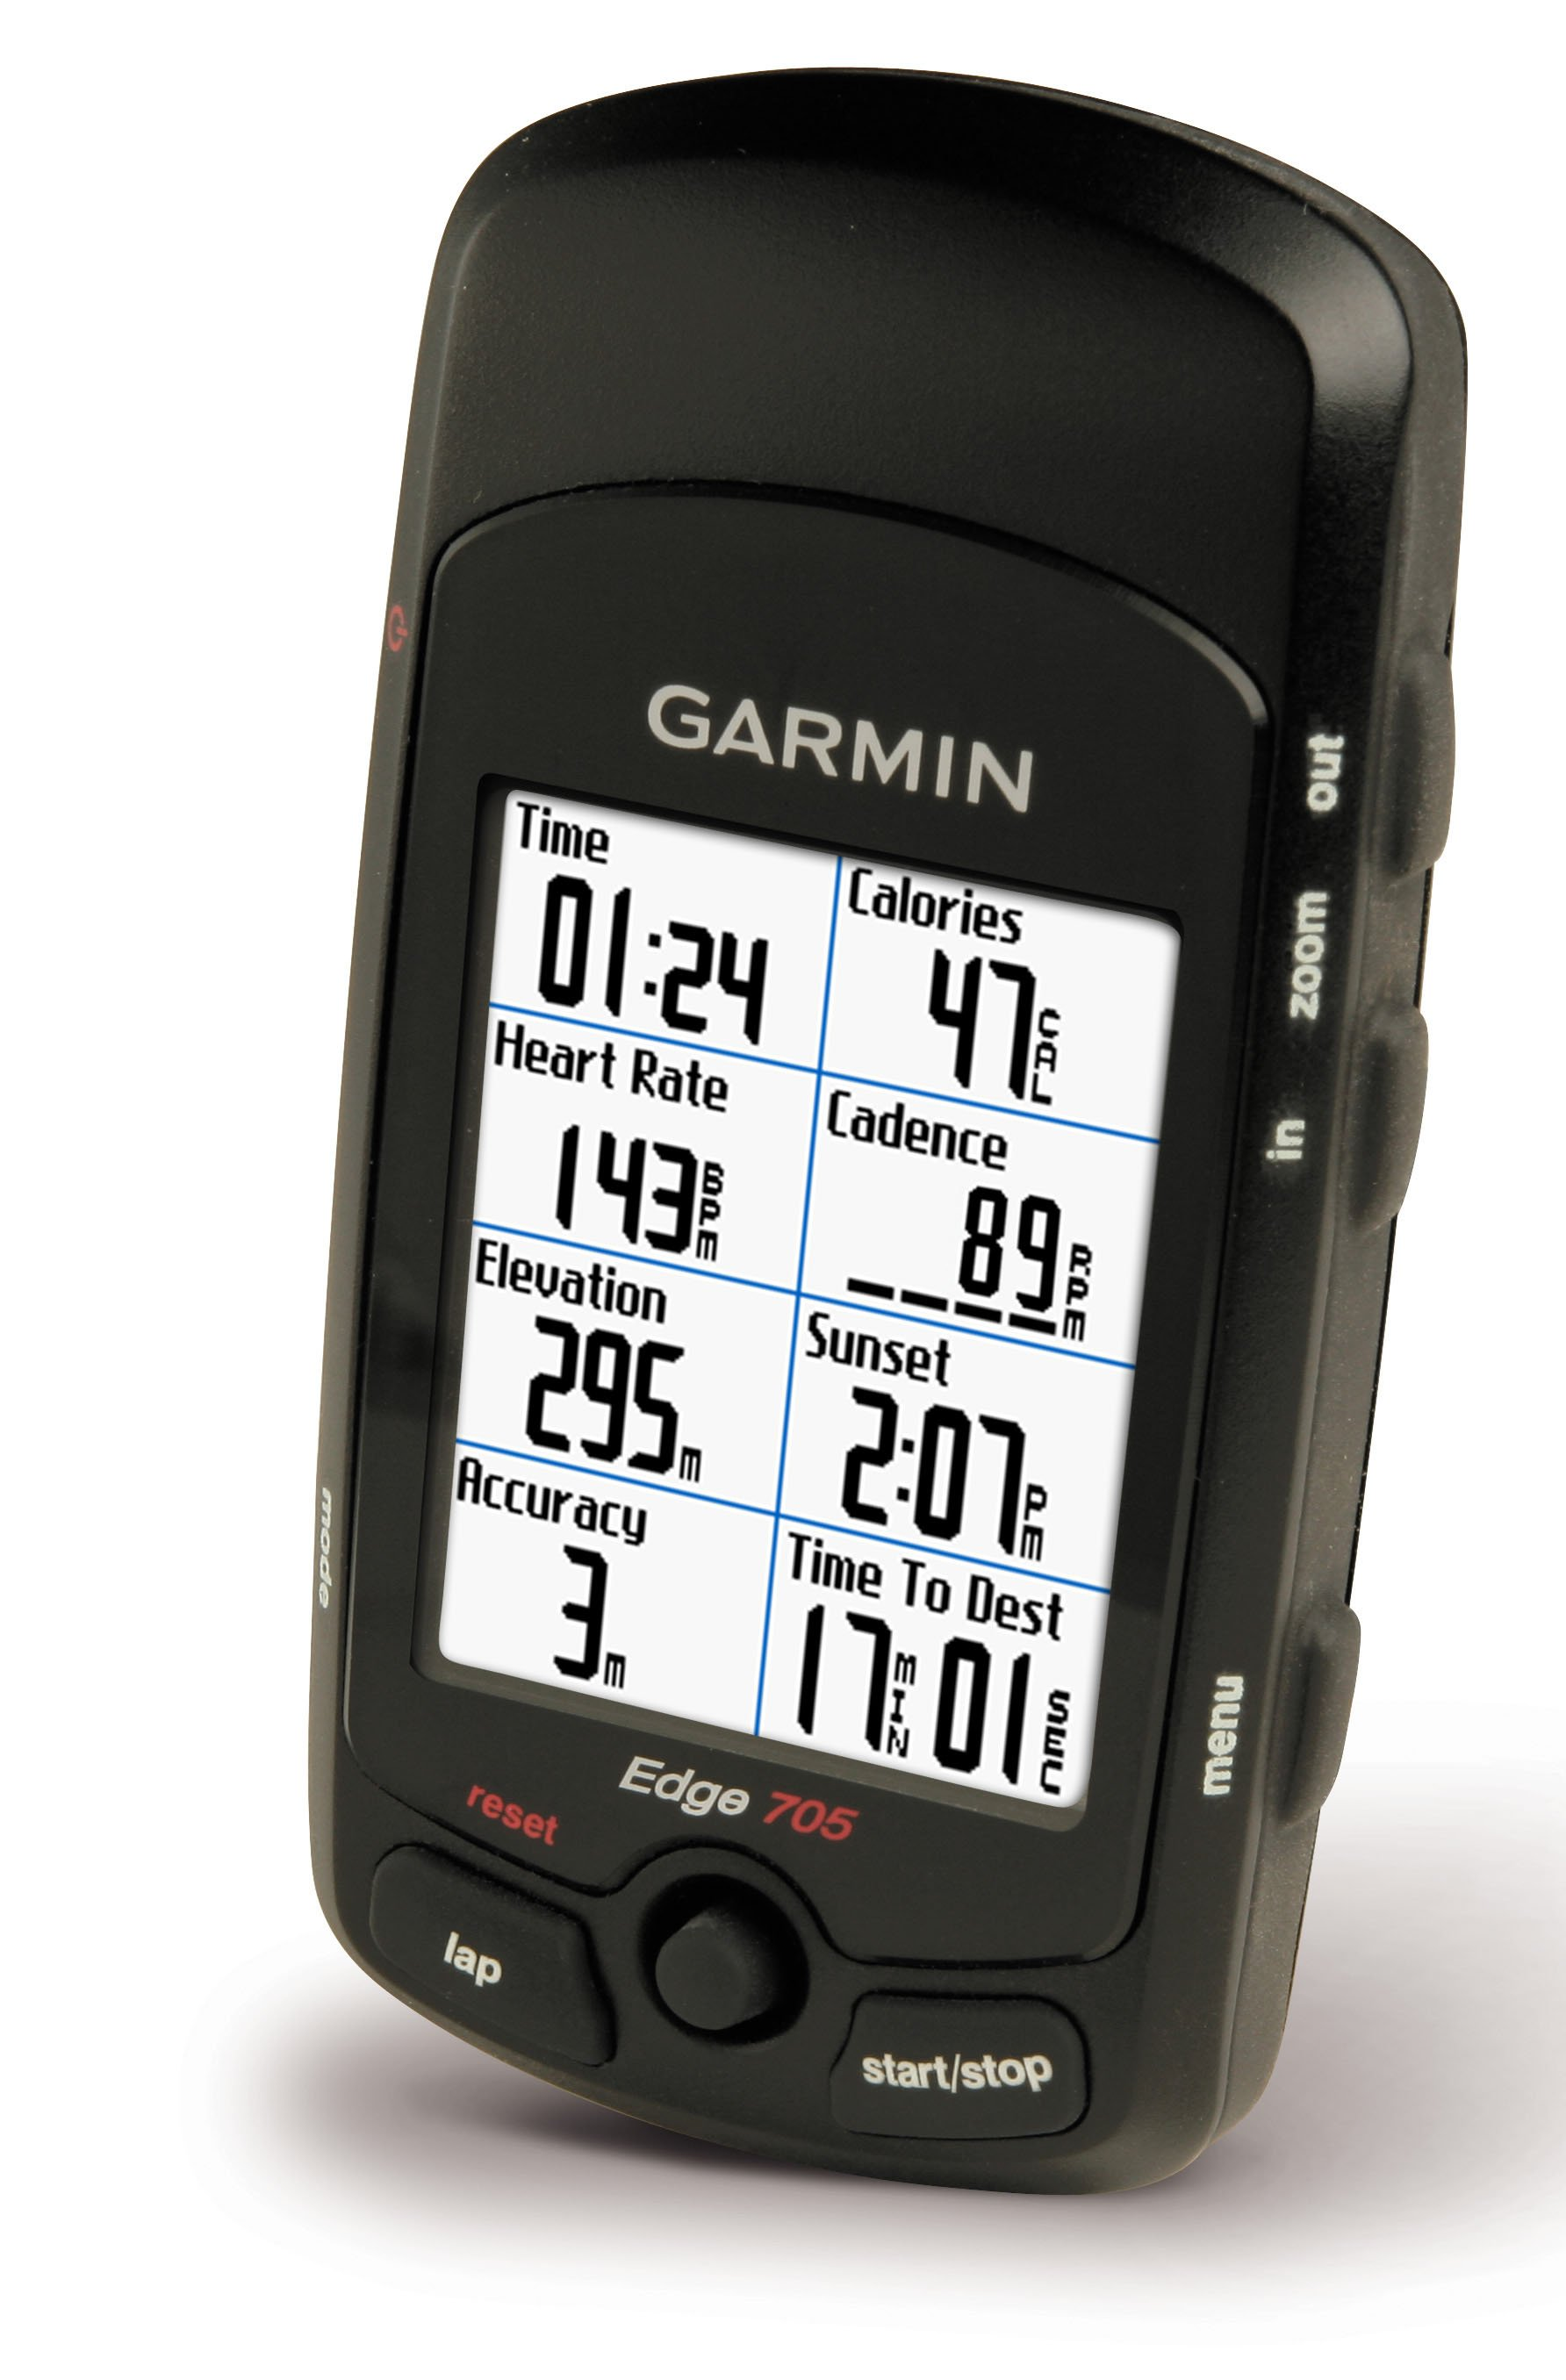 Garmin Edge 705 Bike Computer Review